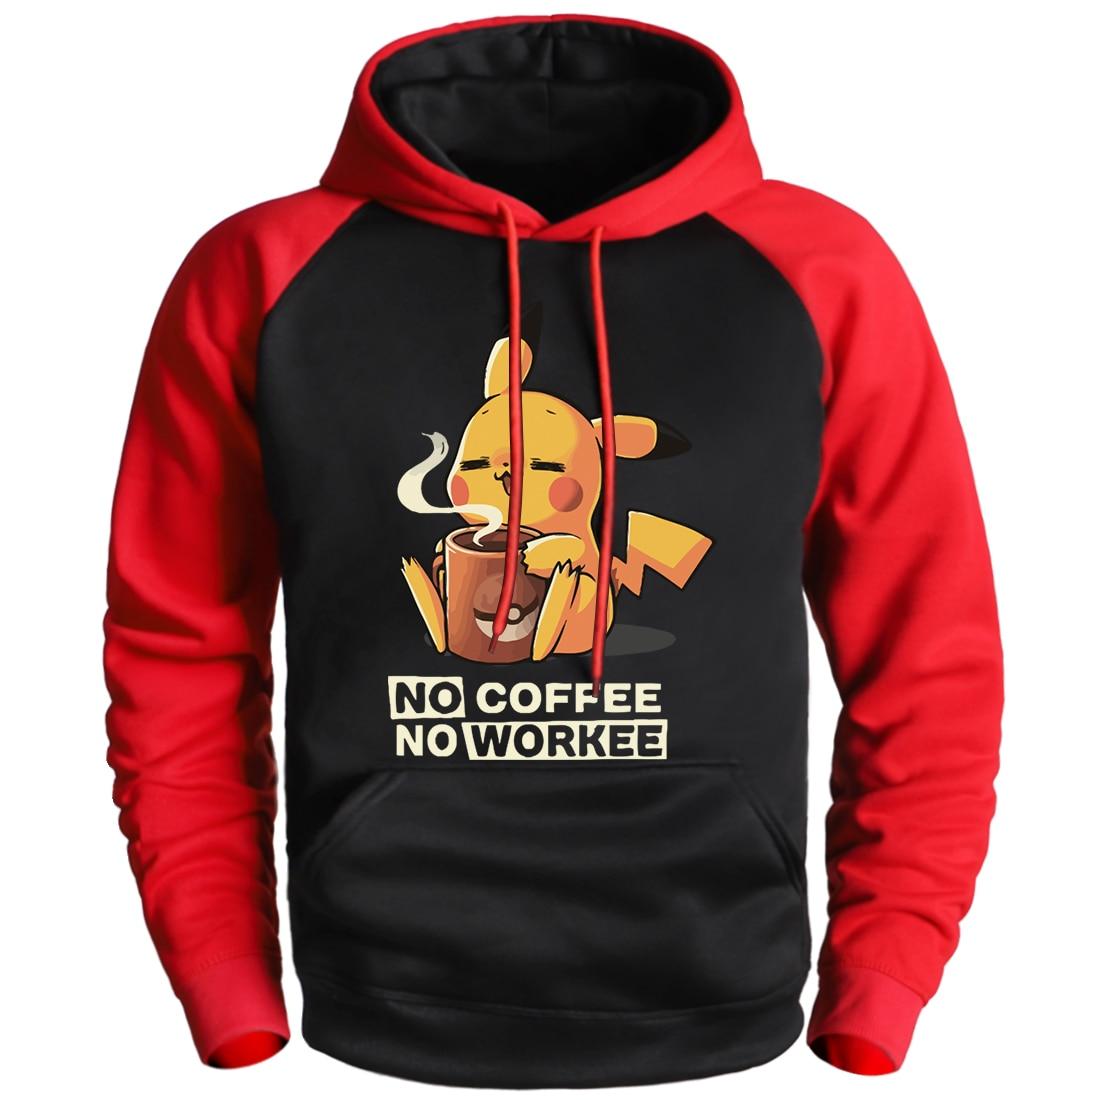 NO COFFEE NO WORKEE Sweatshirt Pikachu Pokemon Hoodie Sweatshirt Pullover Man Winter Fleece Raglan Streetwear 2020 Cartoon Hoody